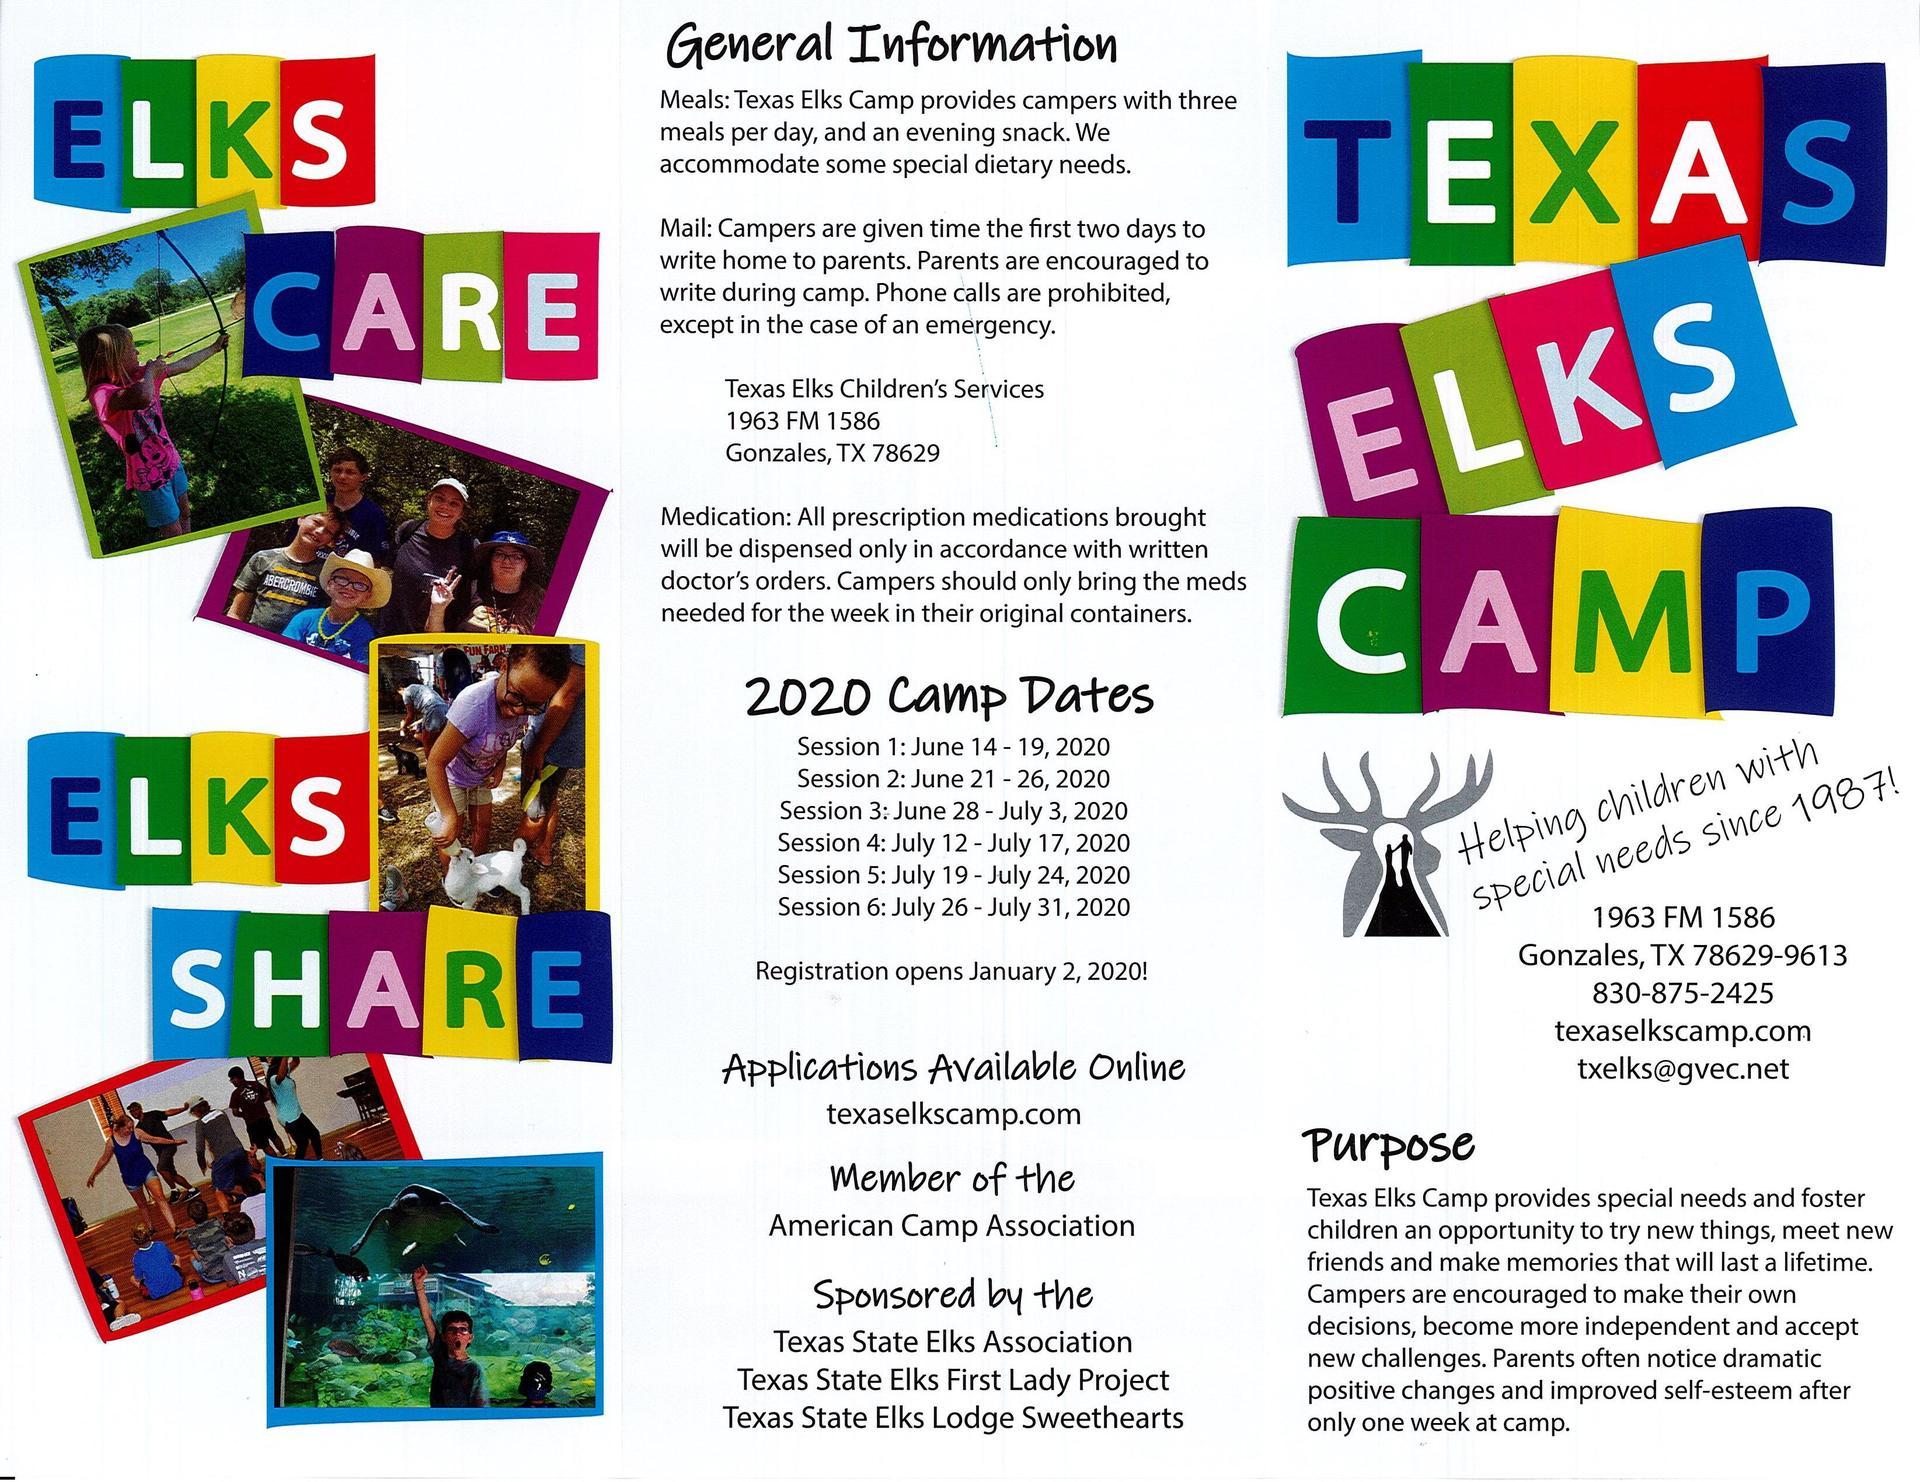 Texas Elks Camp-p1